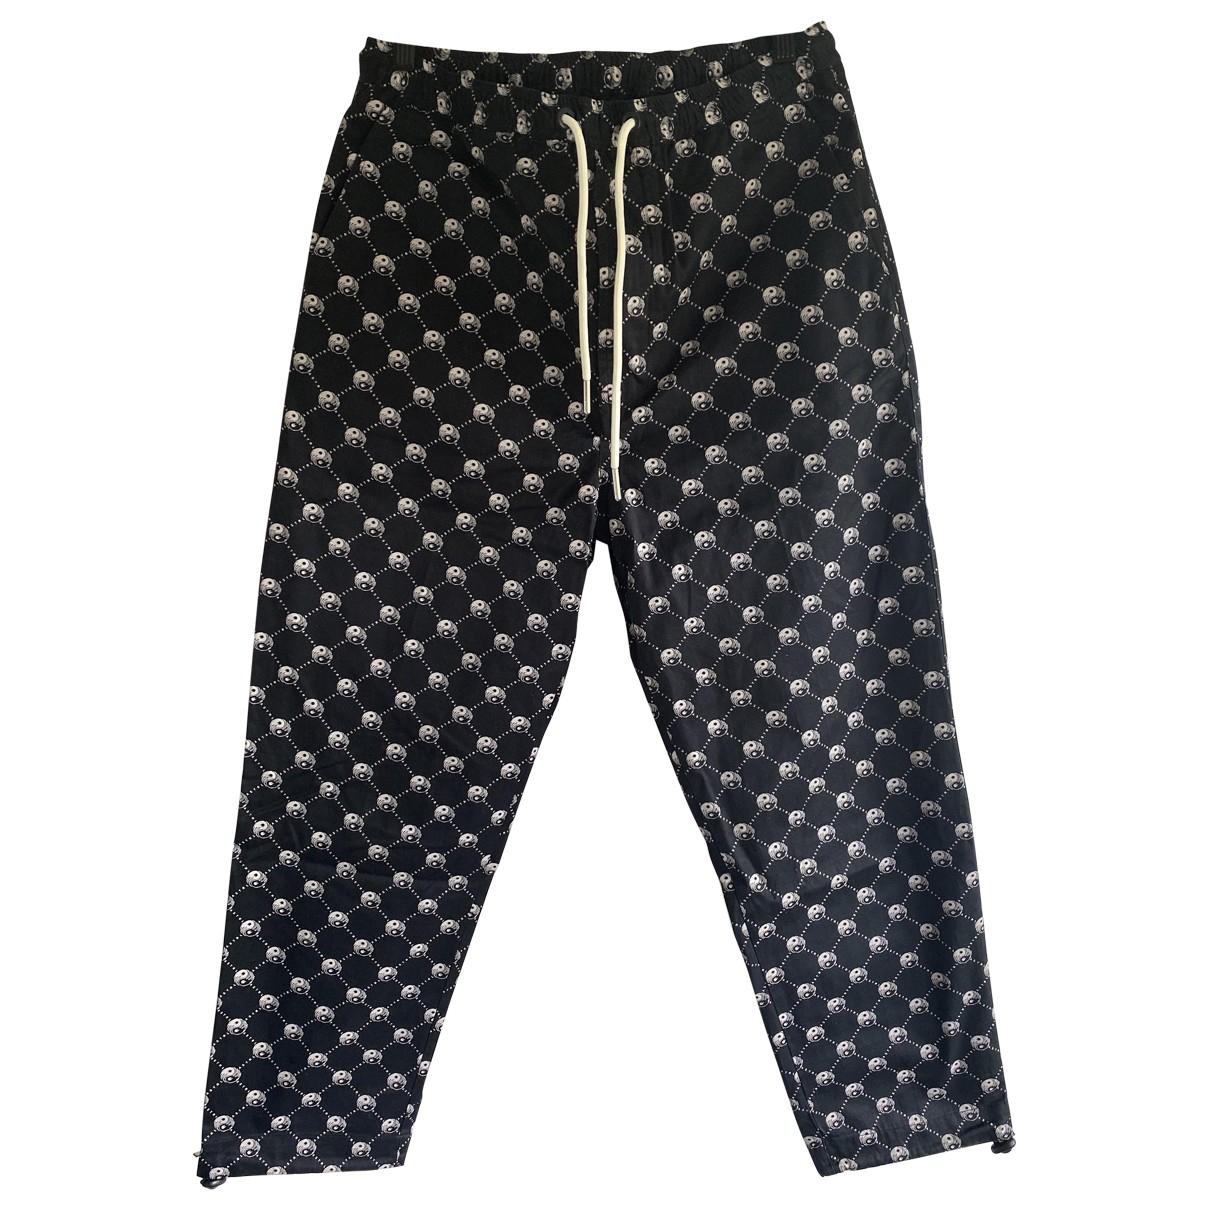 Diesel \N Cotton Trousers for Men S International